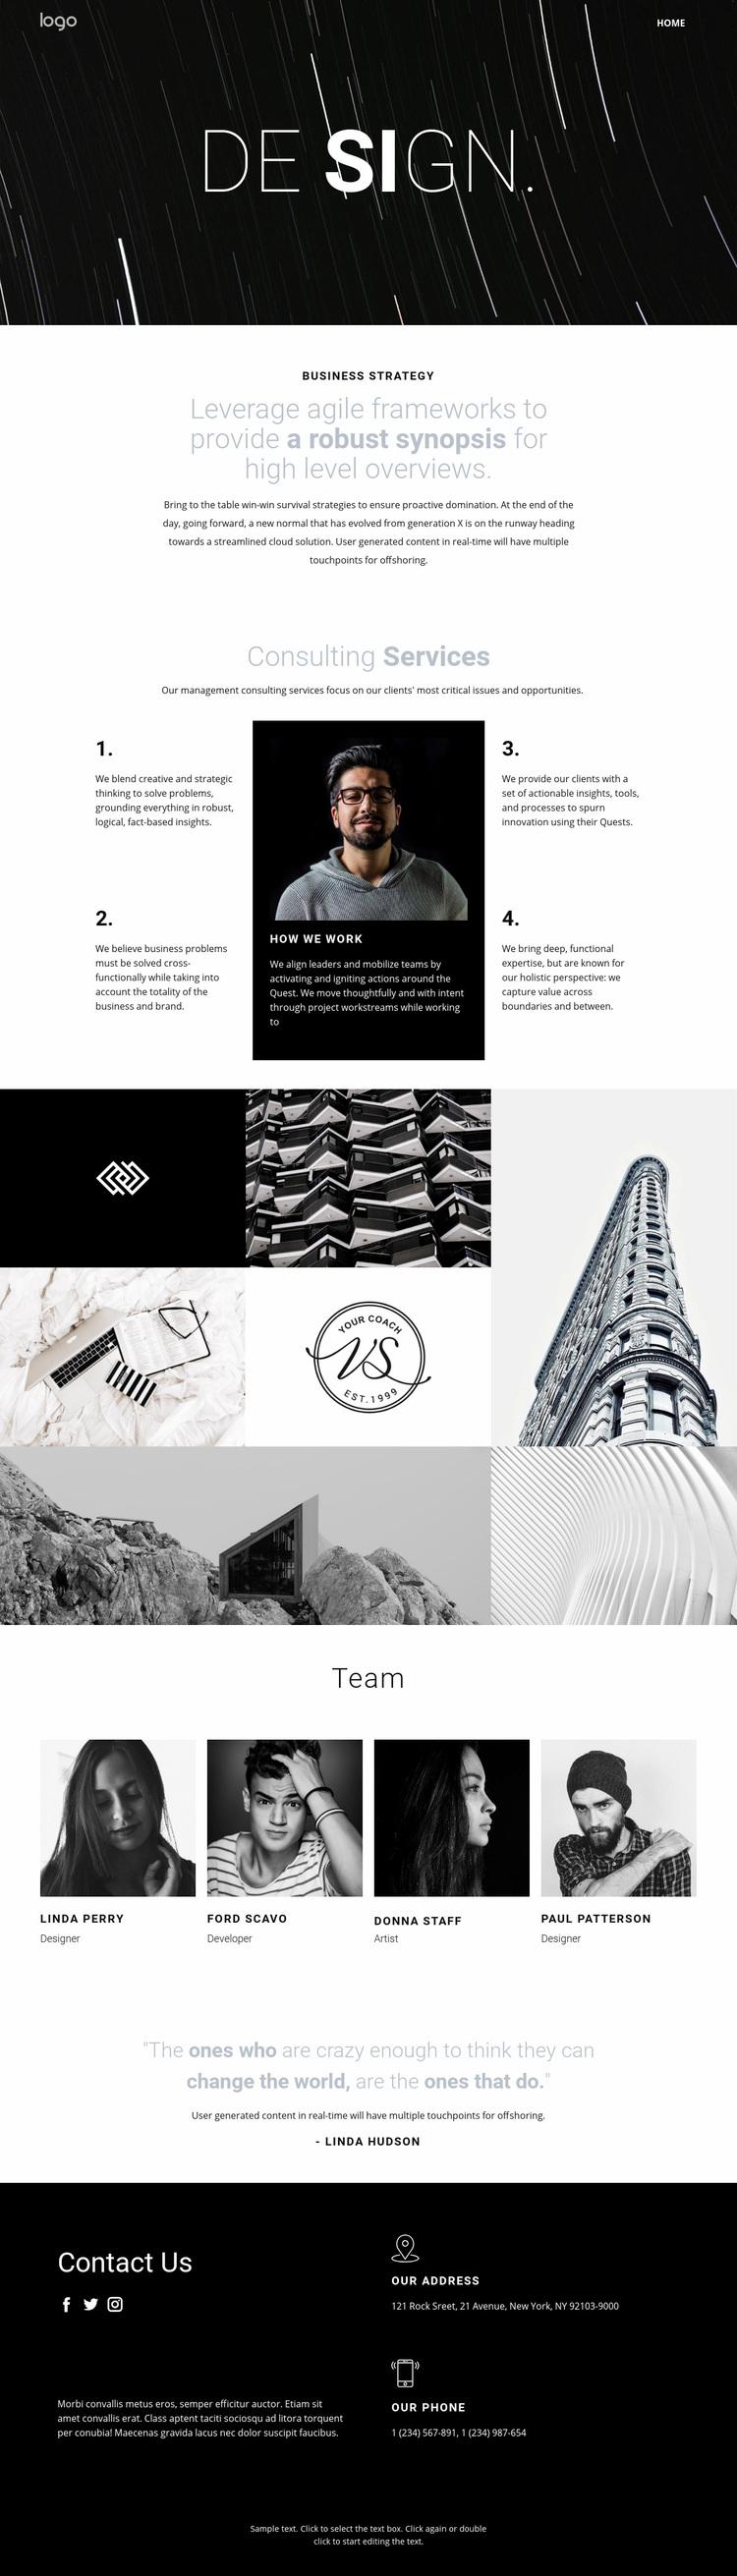 Design and creative art  Web Page Designer